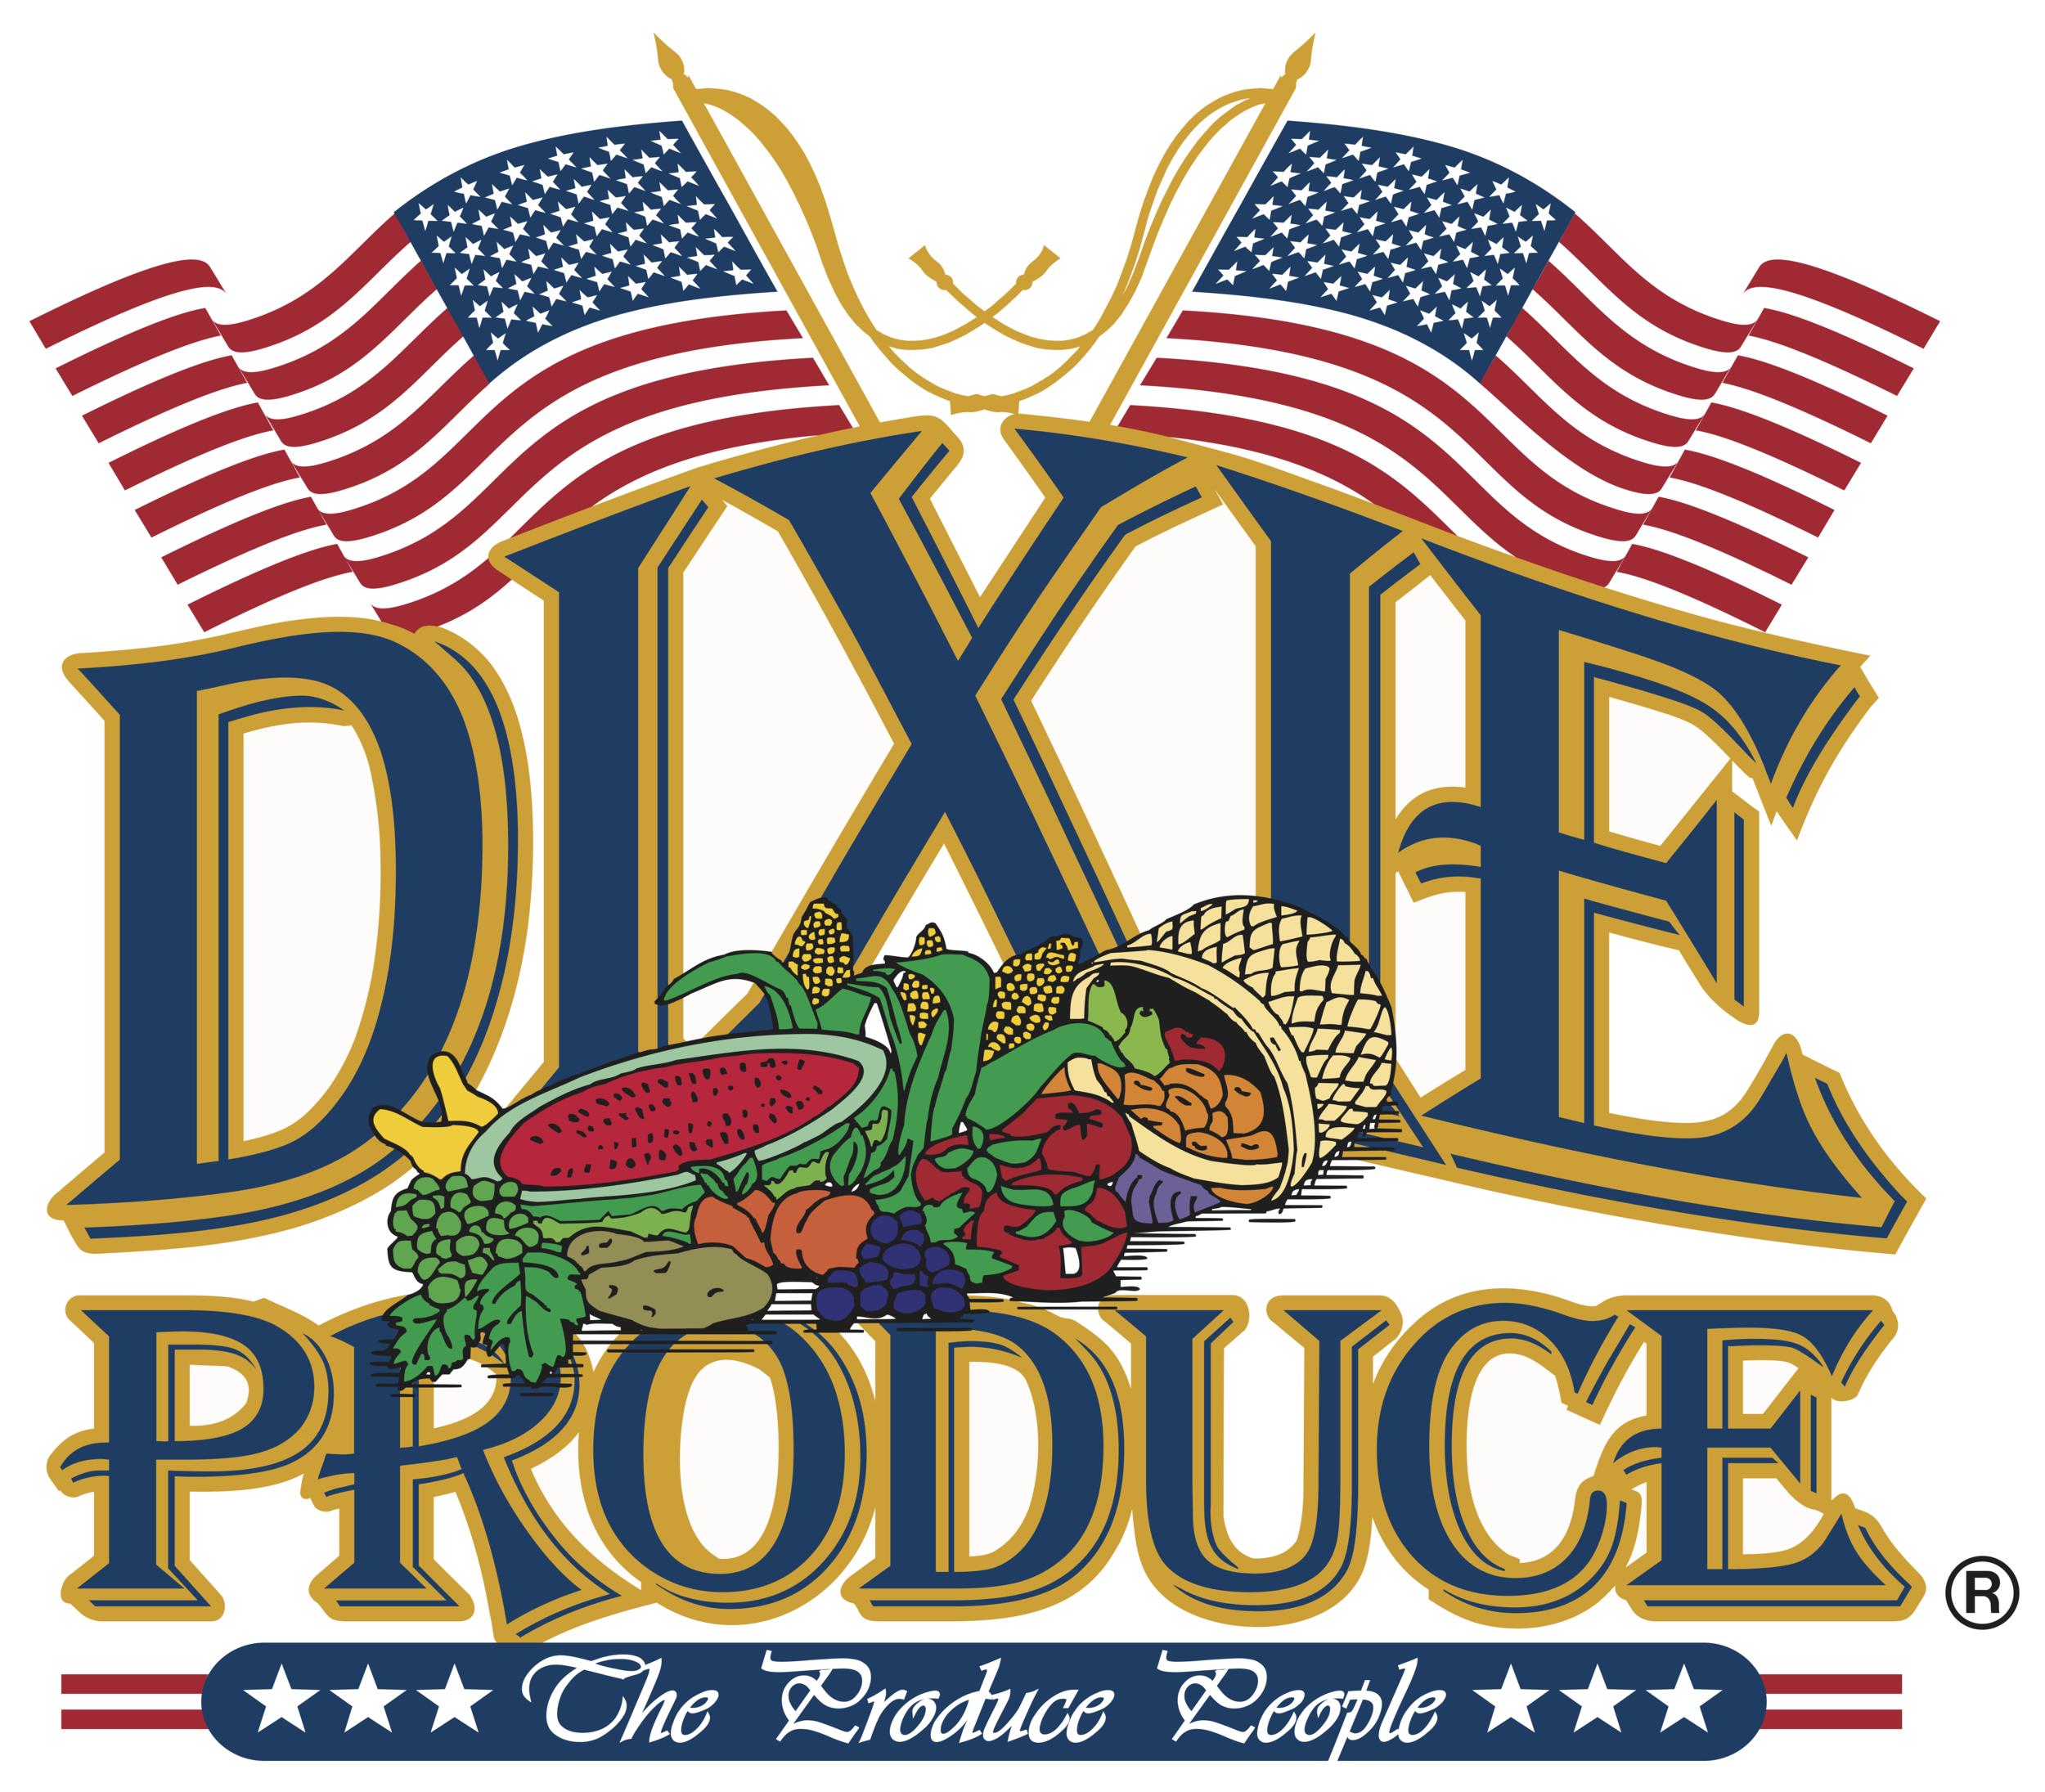 Dixie Produce Art.png